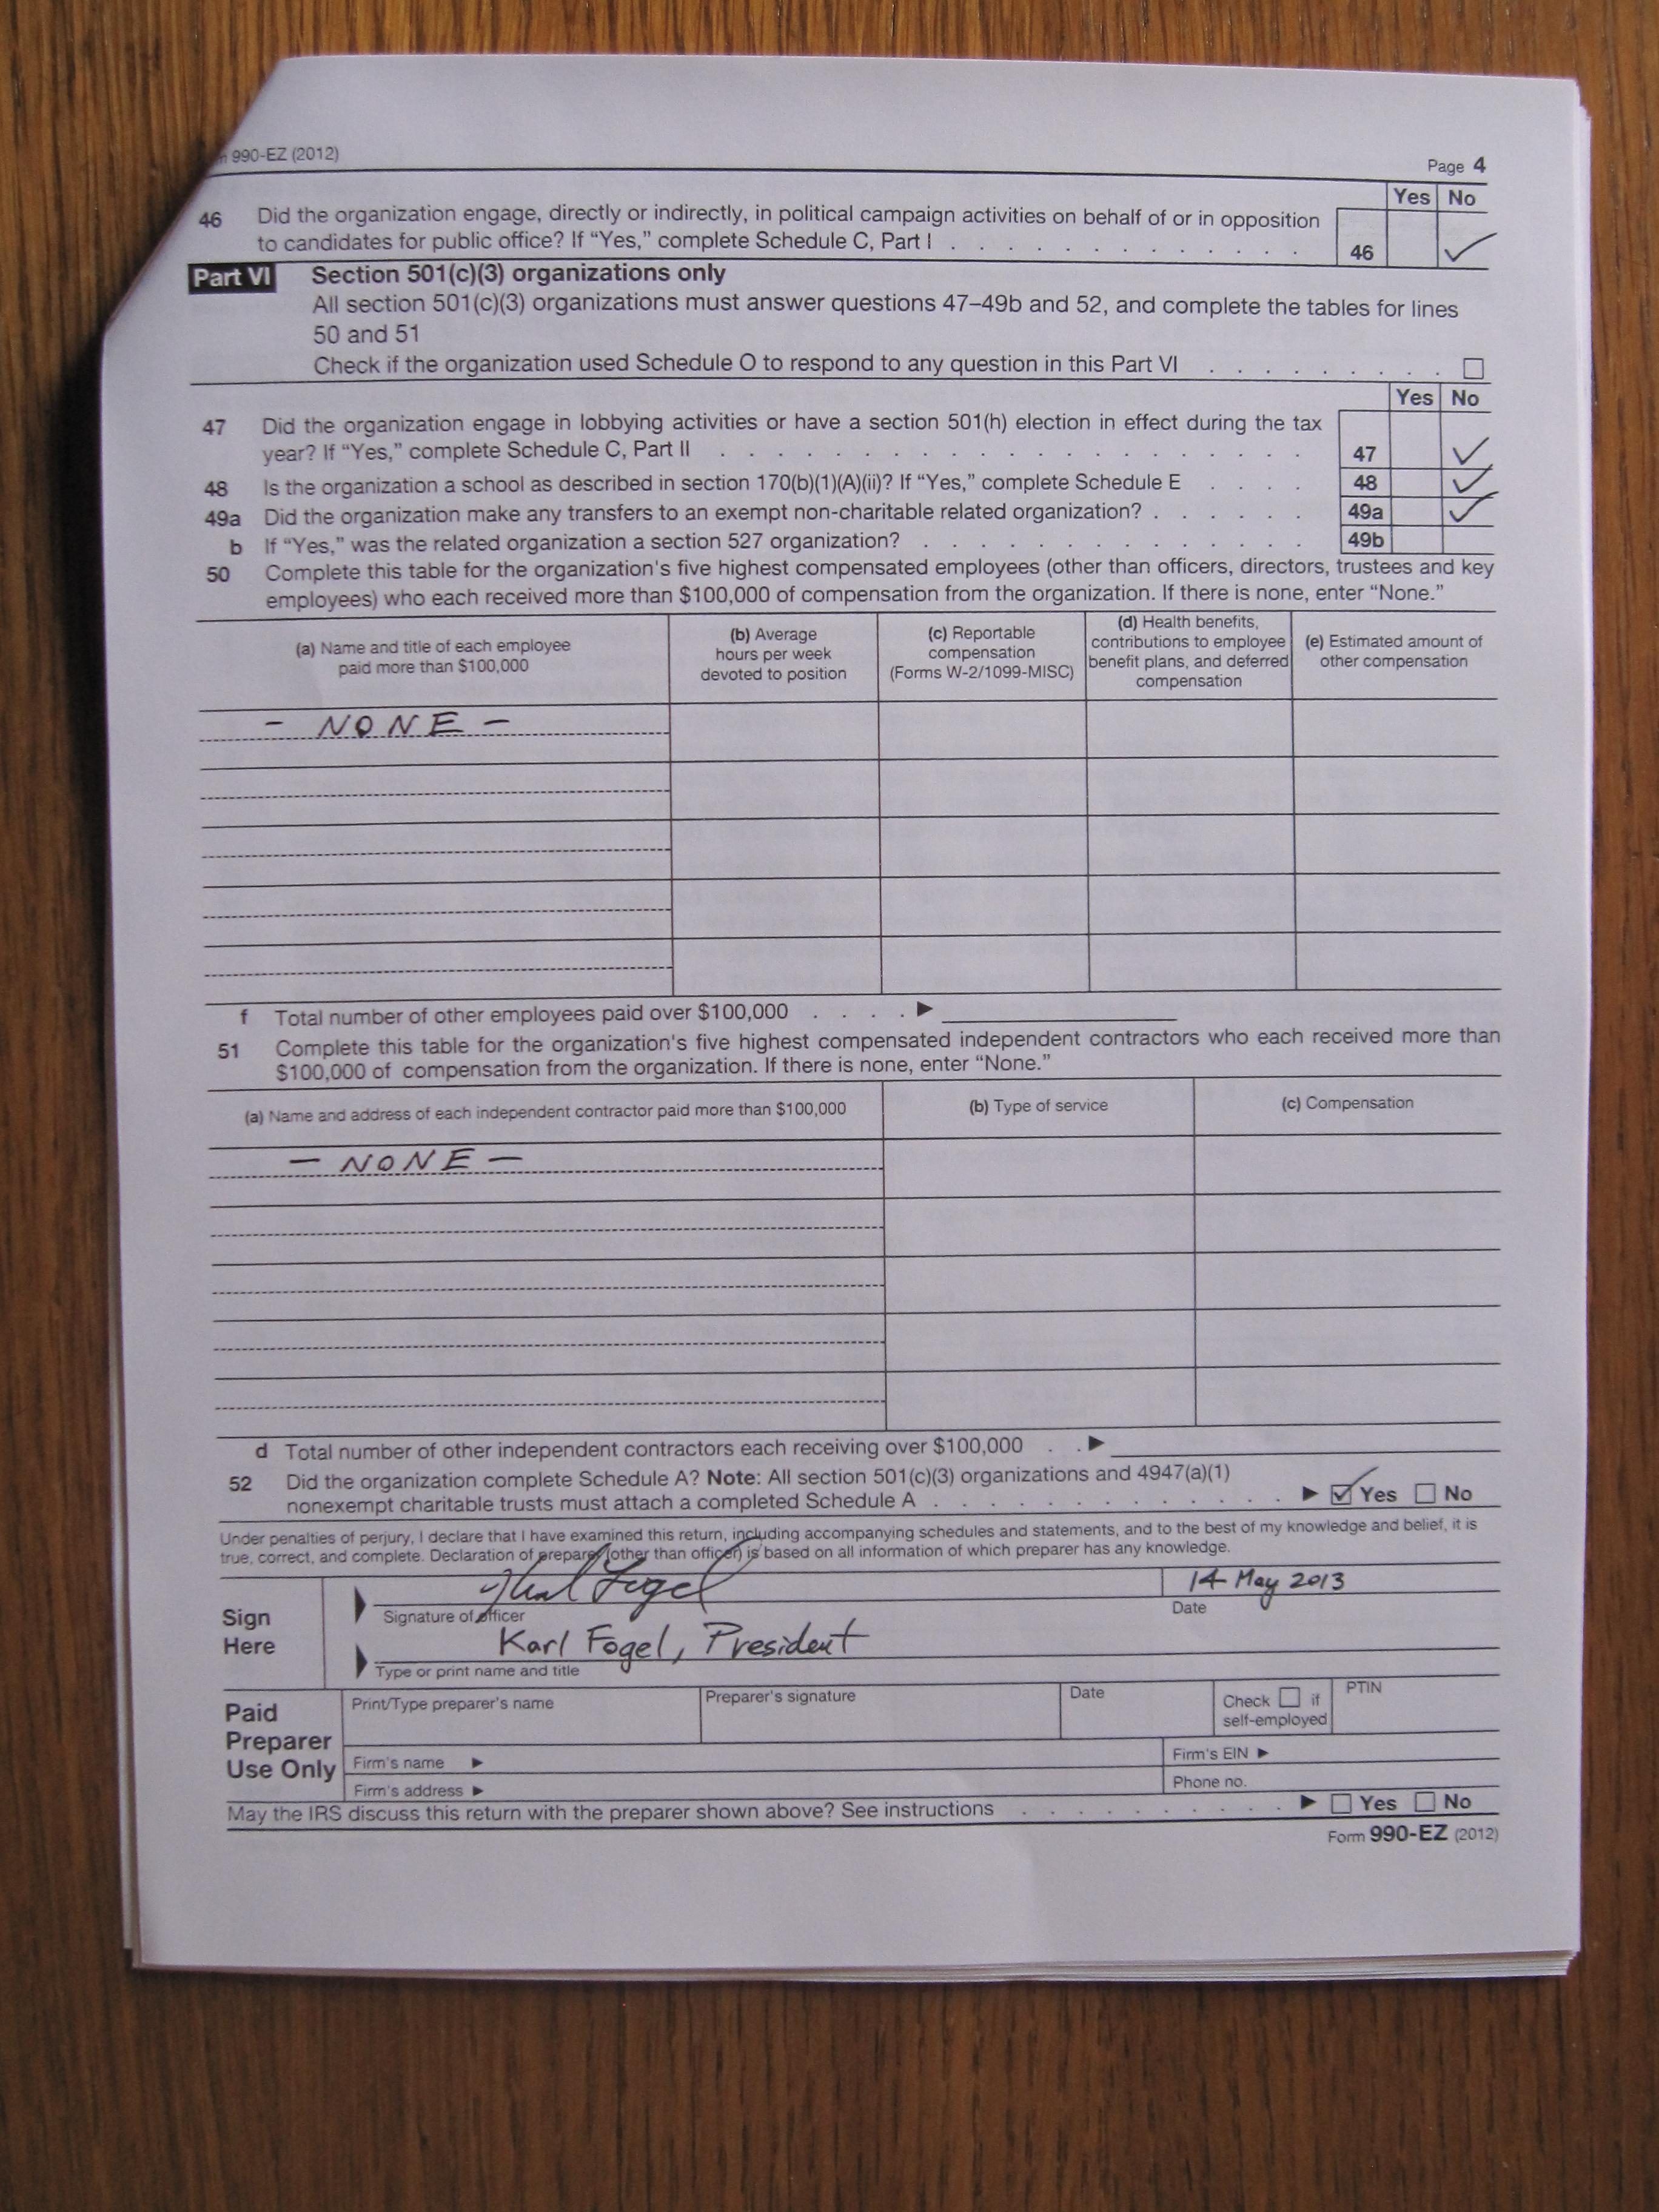 Corporate Documents Tax Returns Etc Questioncopyright